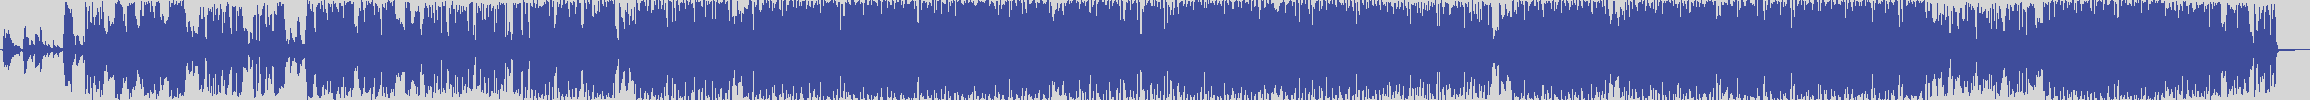 smilax_dig_records [Smilax_X448DIG] Don Lore V - Despacito [Original Version] audio wave form